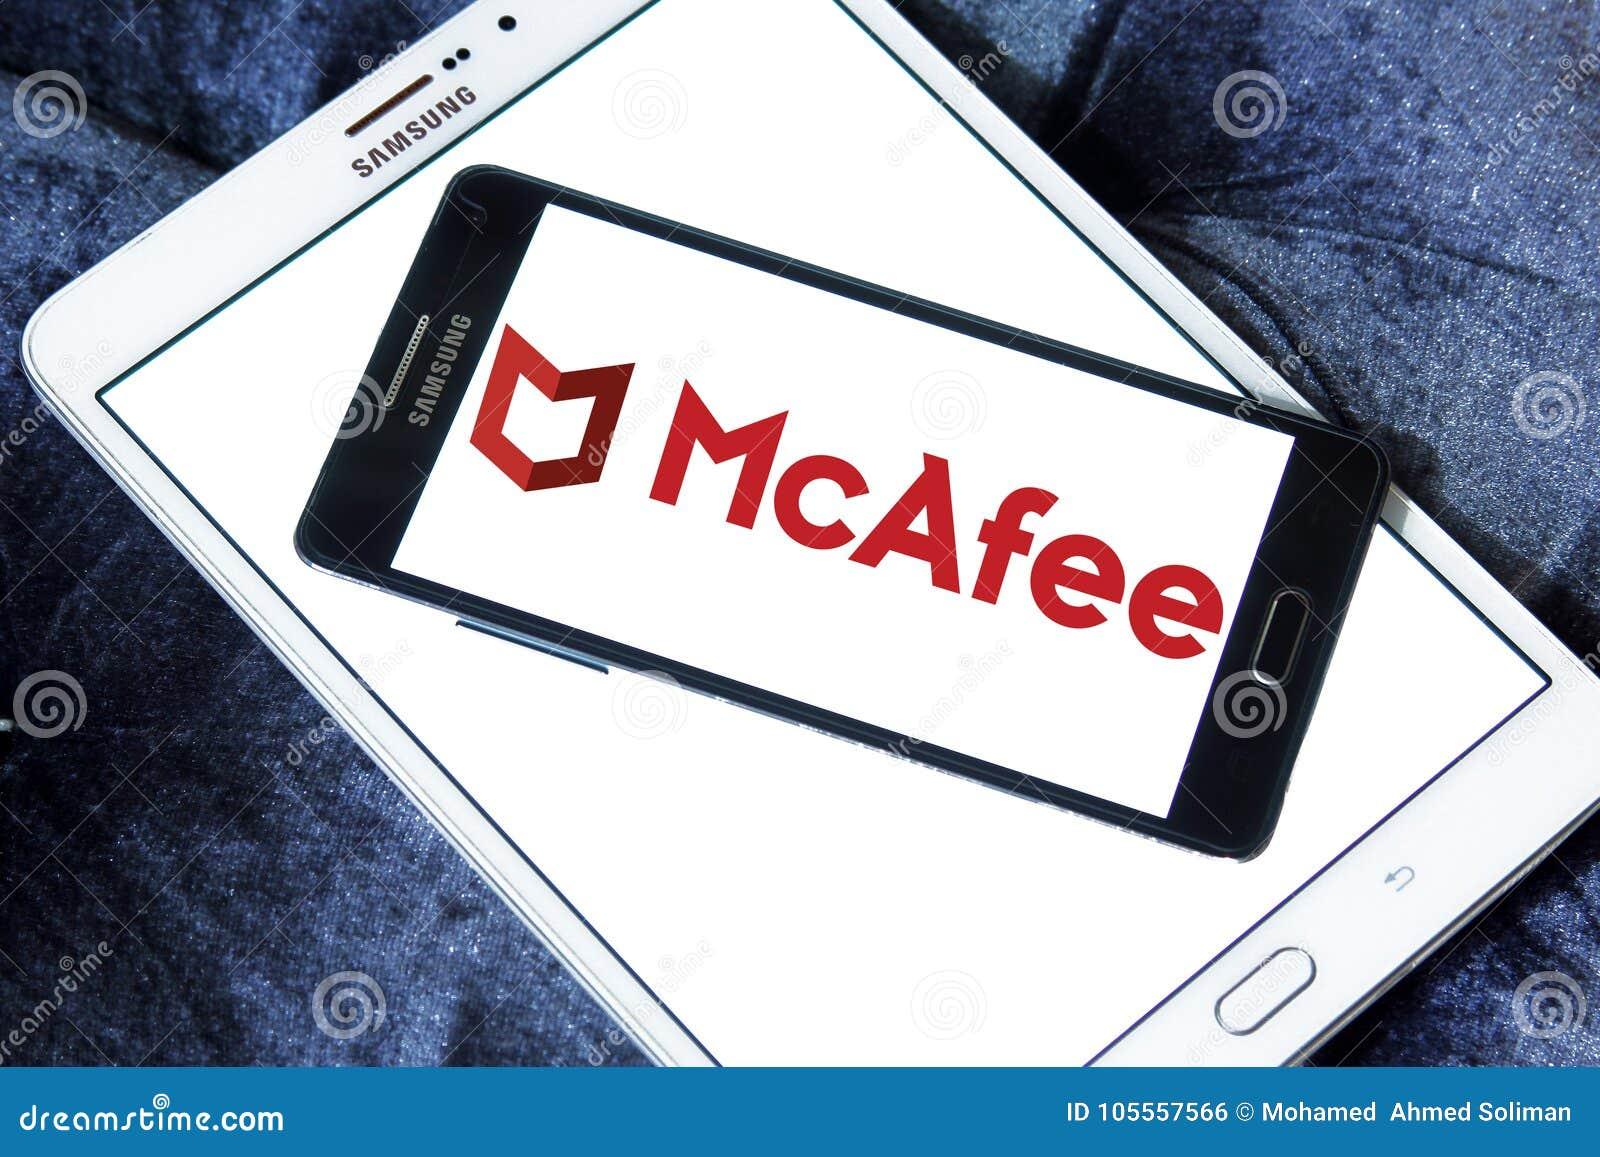 McAfee company logo editorial photo  Image of logos - 105557566